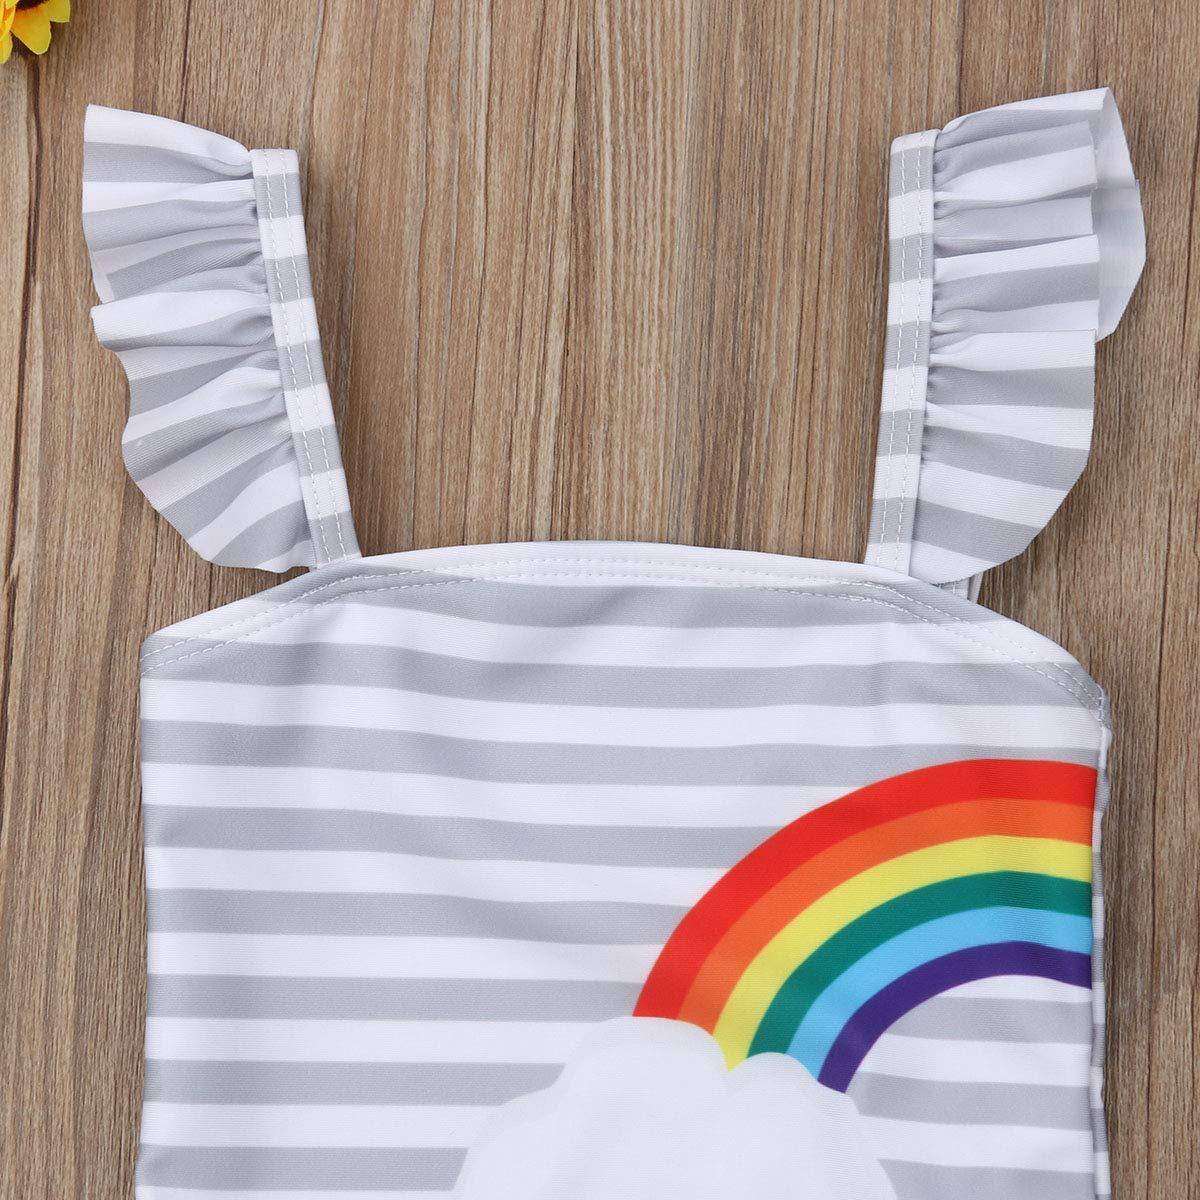 Kids Toddler Baby Girl One-Piece Swimsuit Beach Wear Twins Rainbow Striped Swimwear Bathing Suits 6M-5T